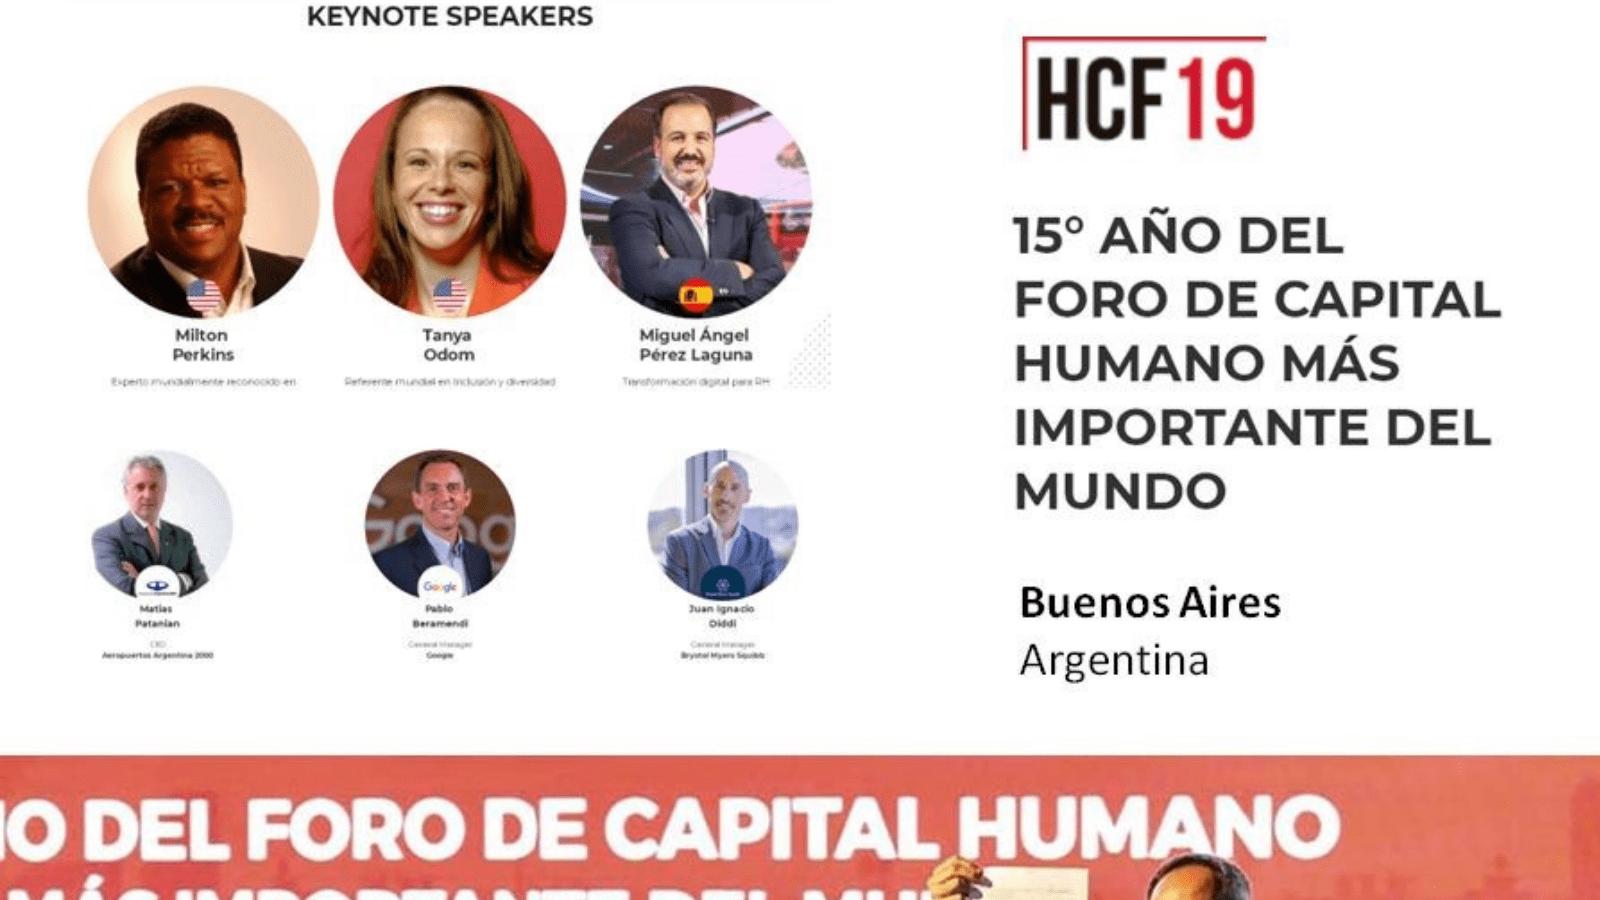 Human Capital Forum con Miguel Ángel Pérez Laguna